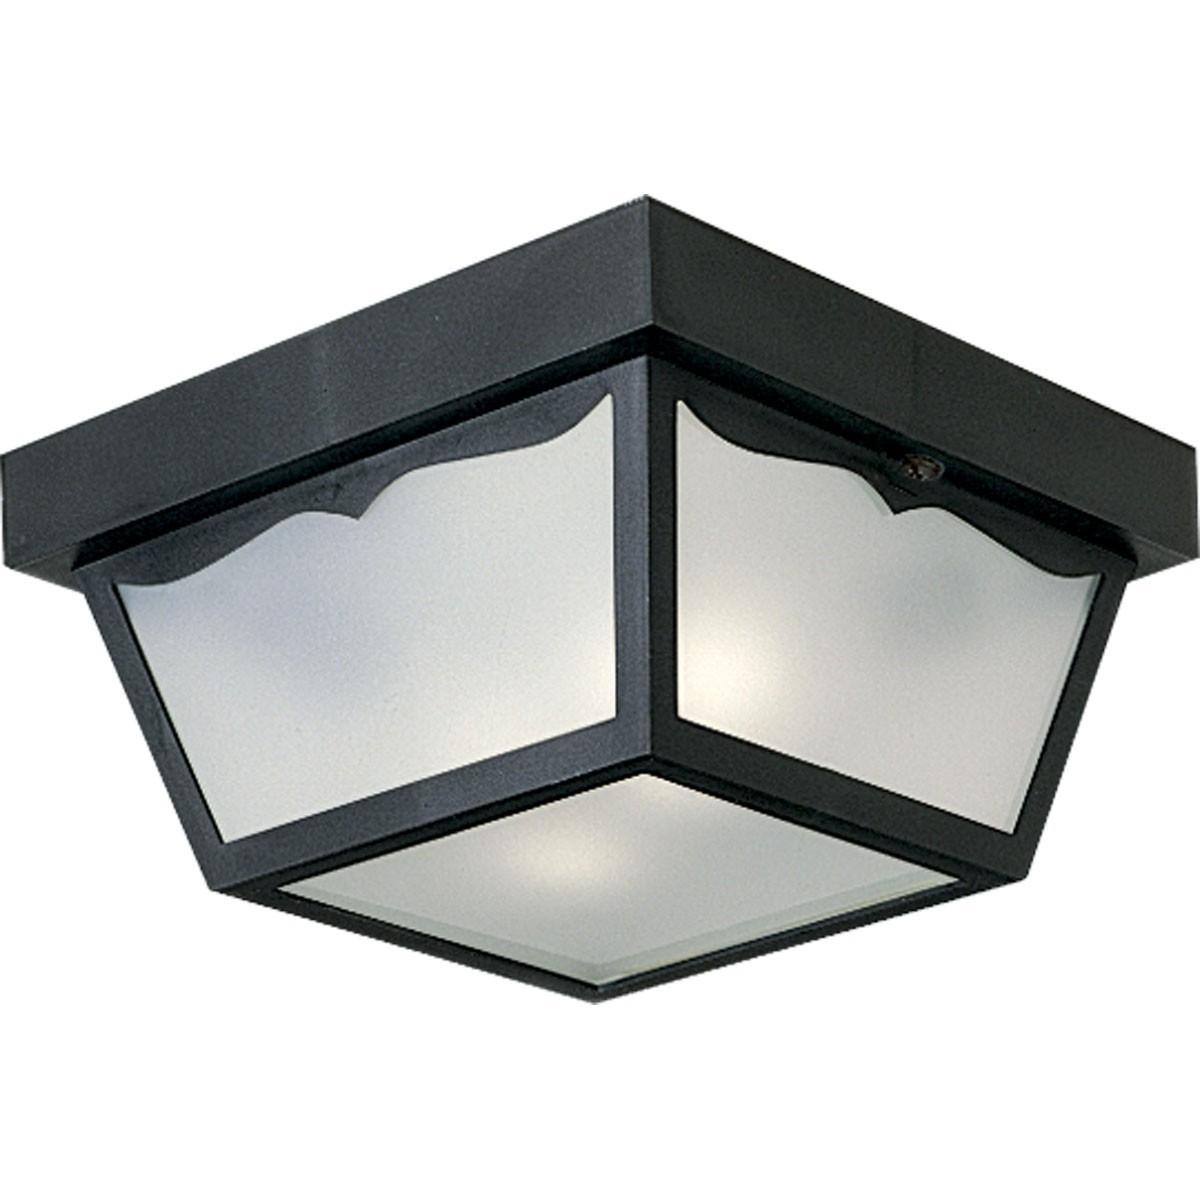 Outdoor Lighting: Astonishing Dusk To Dawn Outdoor Ceiling Light Led In Outdoor Ceiling Pendant Lights (#12 of 15)